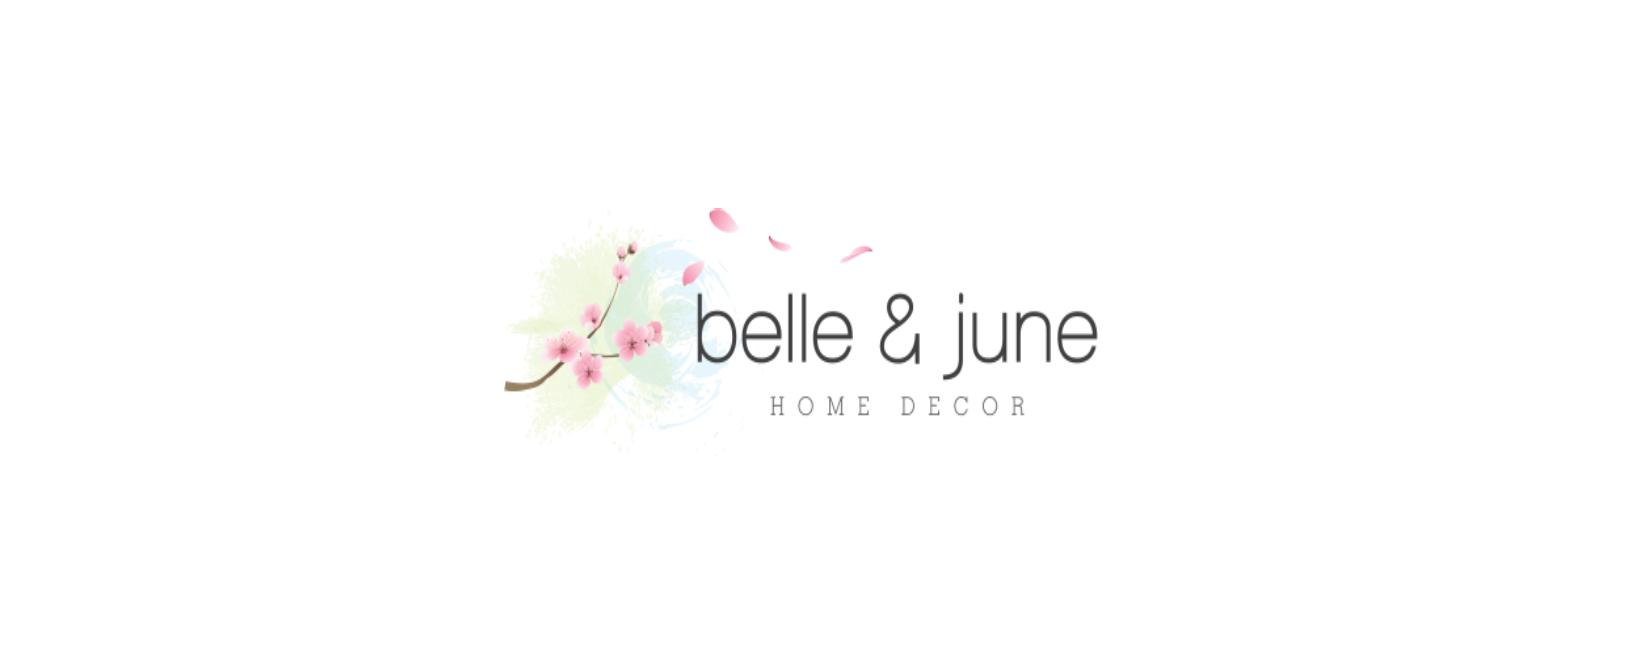 Belle & June Coupon Code 2021